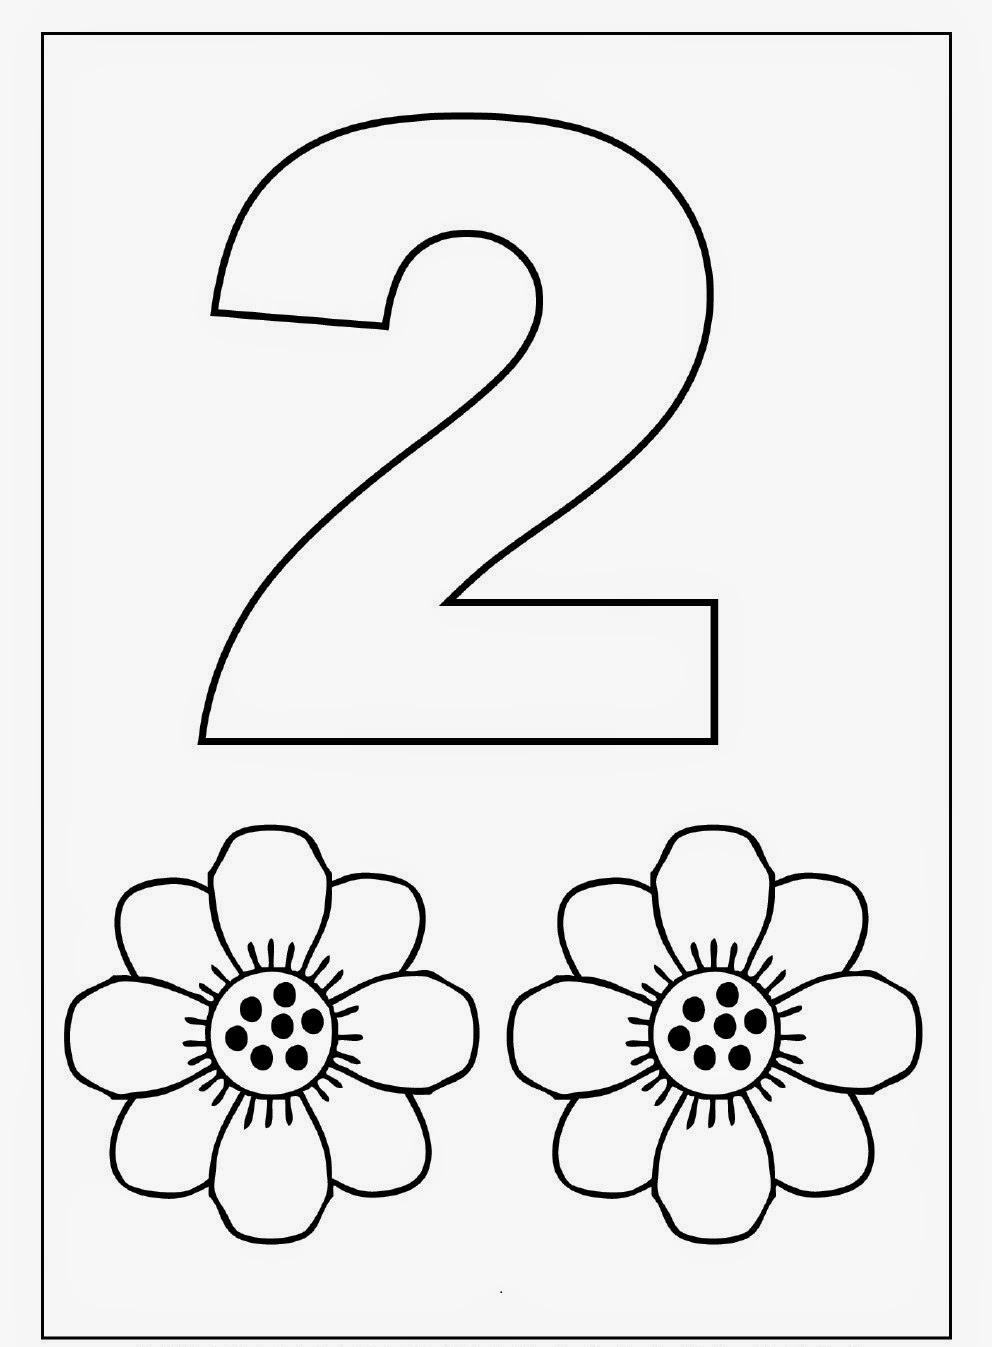 Number 2 Kindergarten Coloring Pages